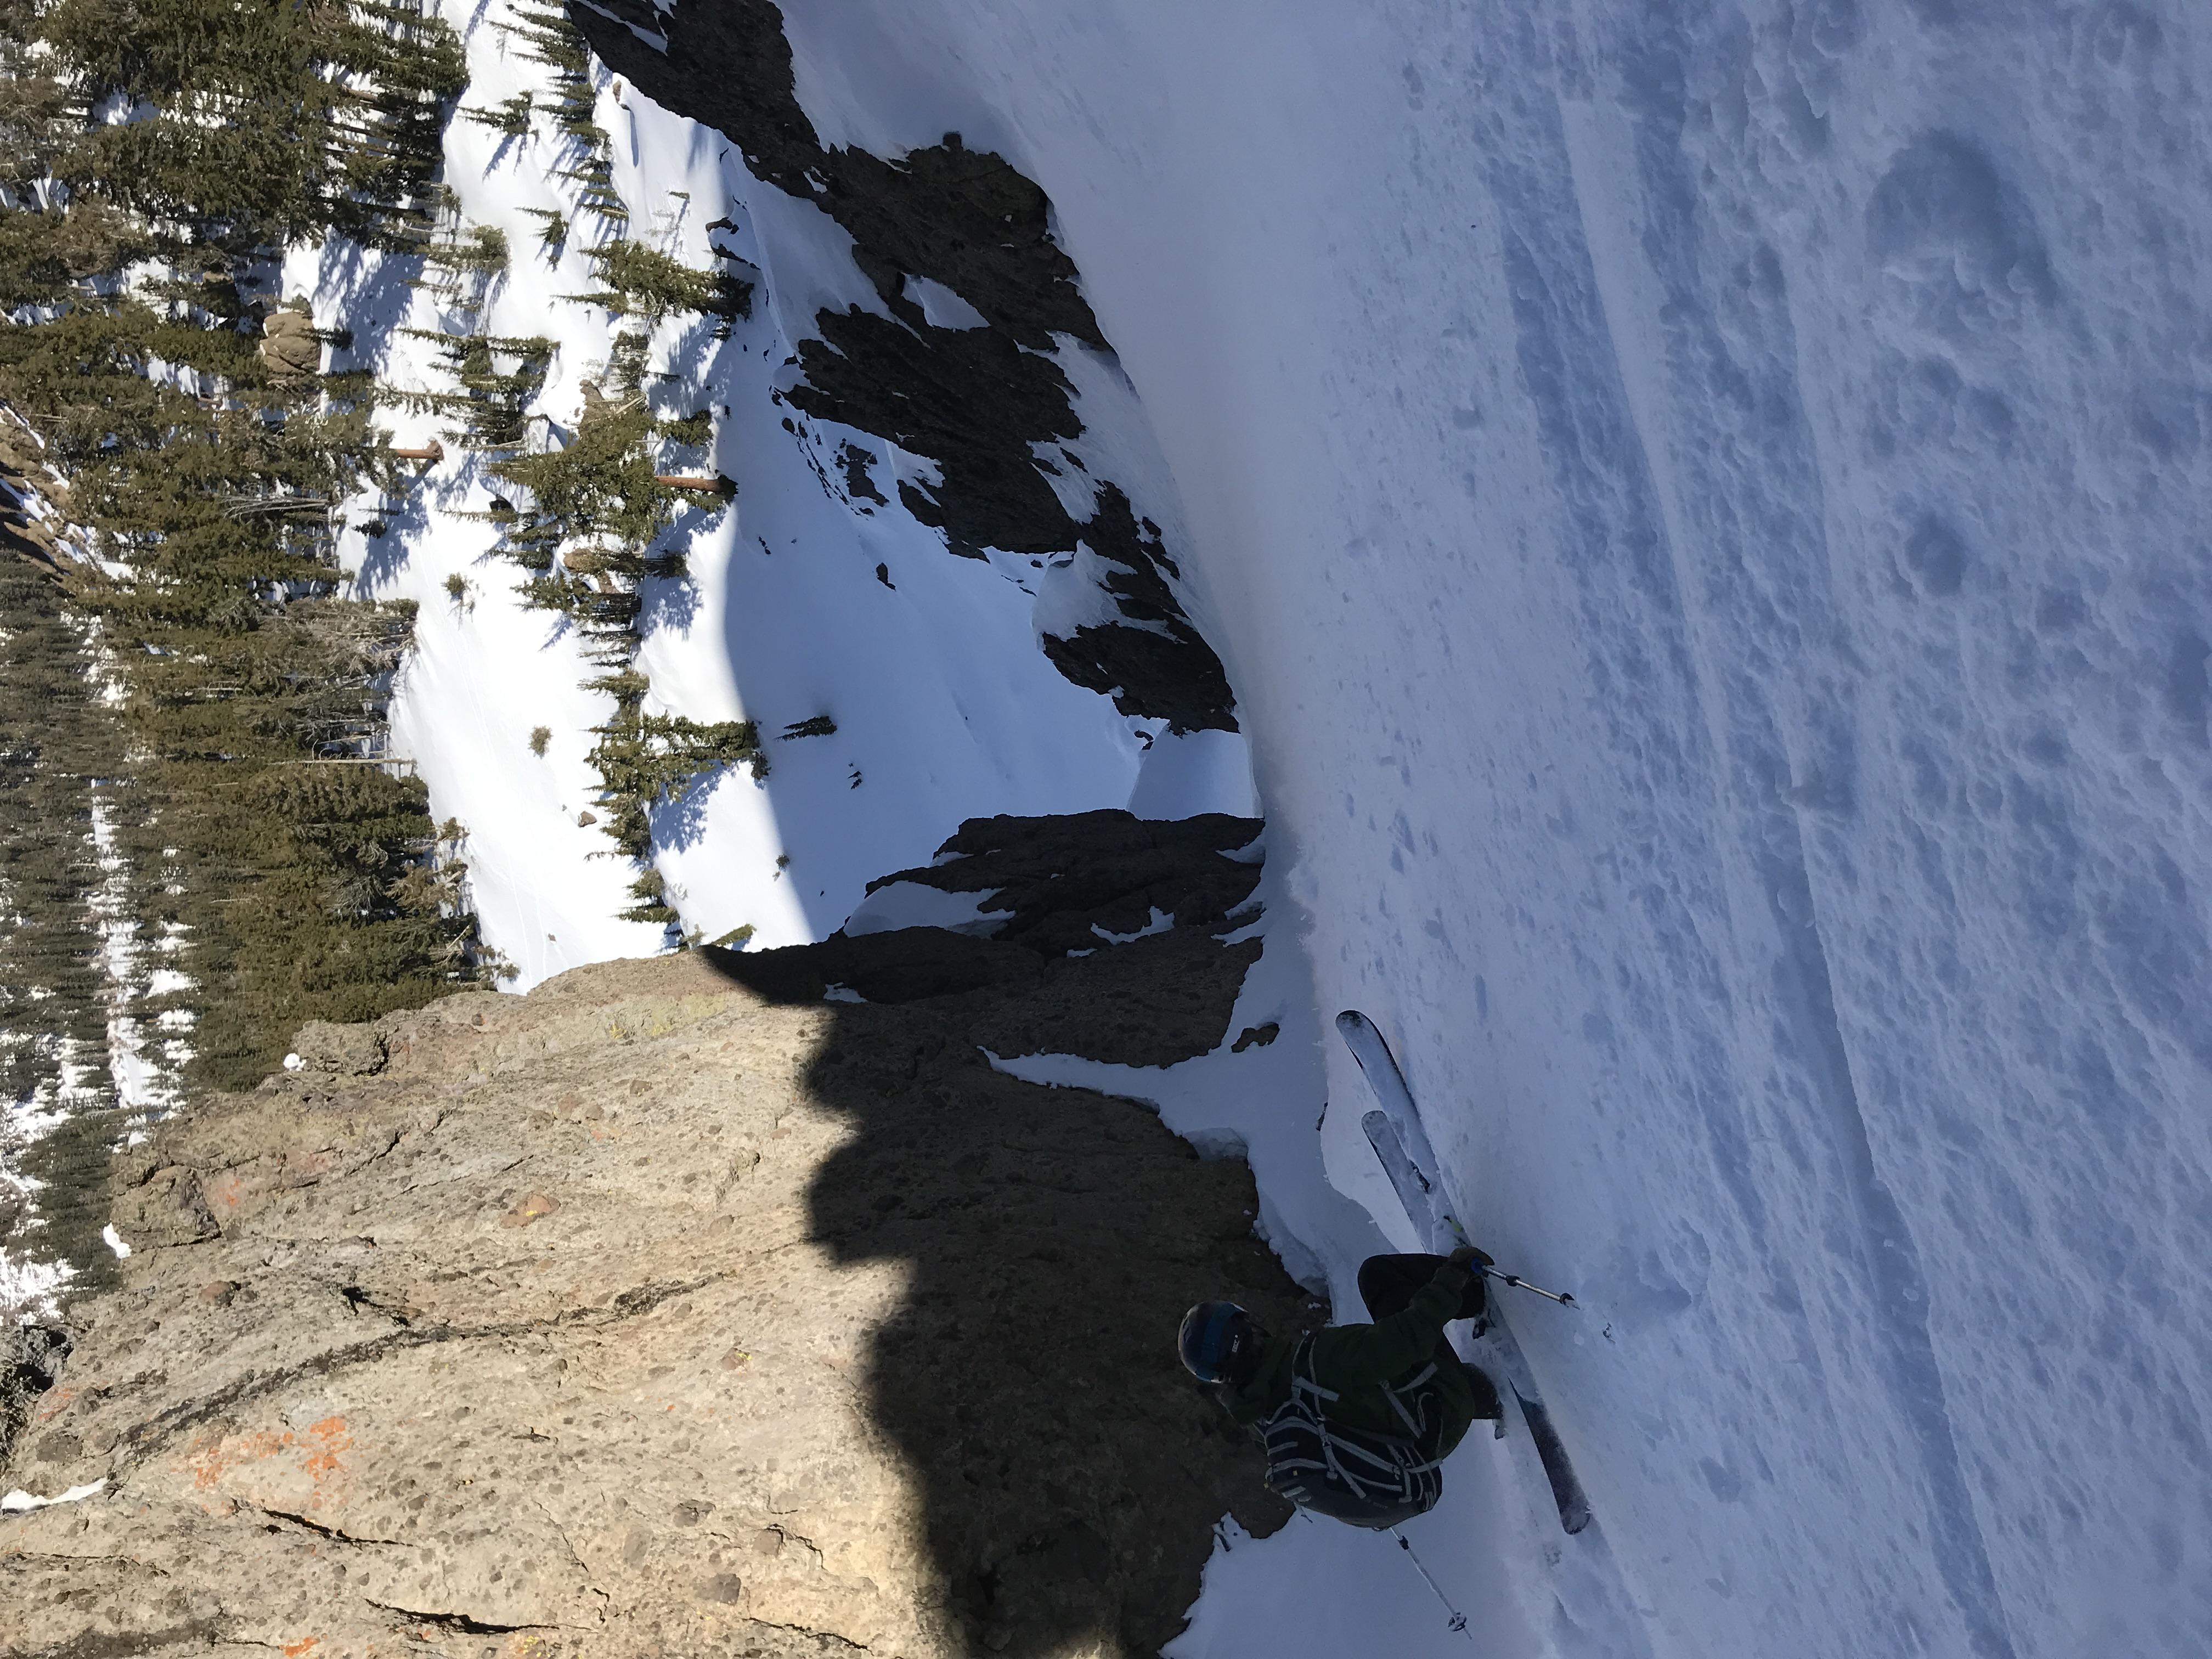 Tahoe backcountry